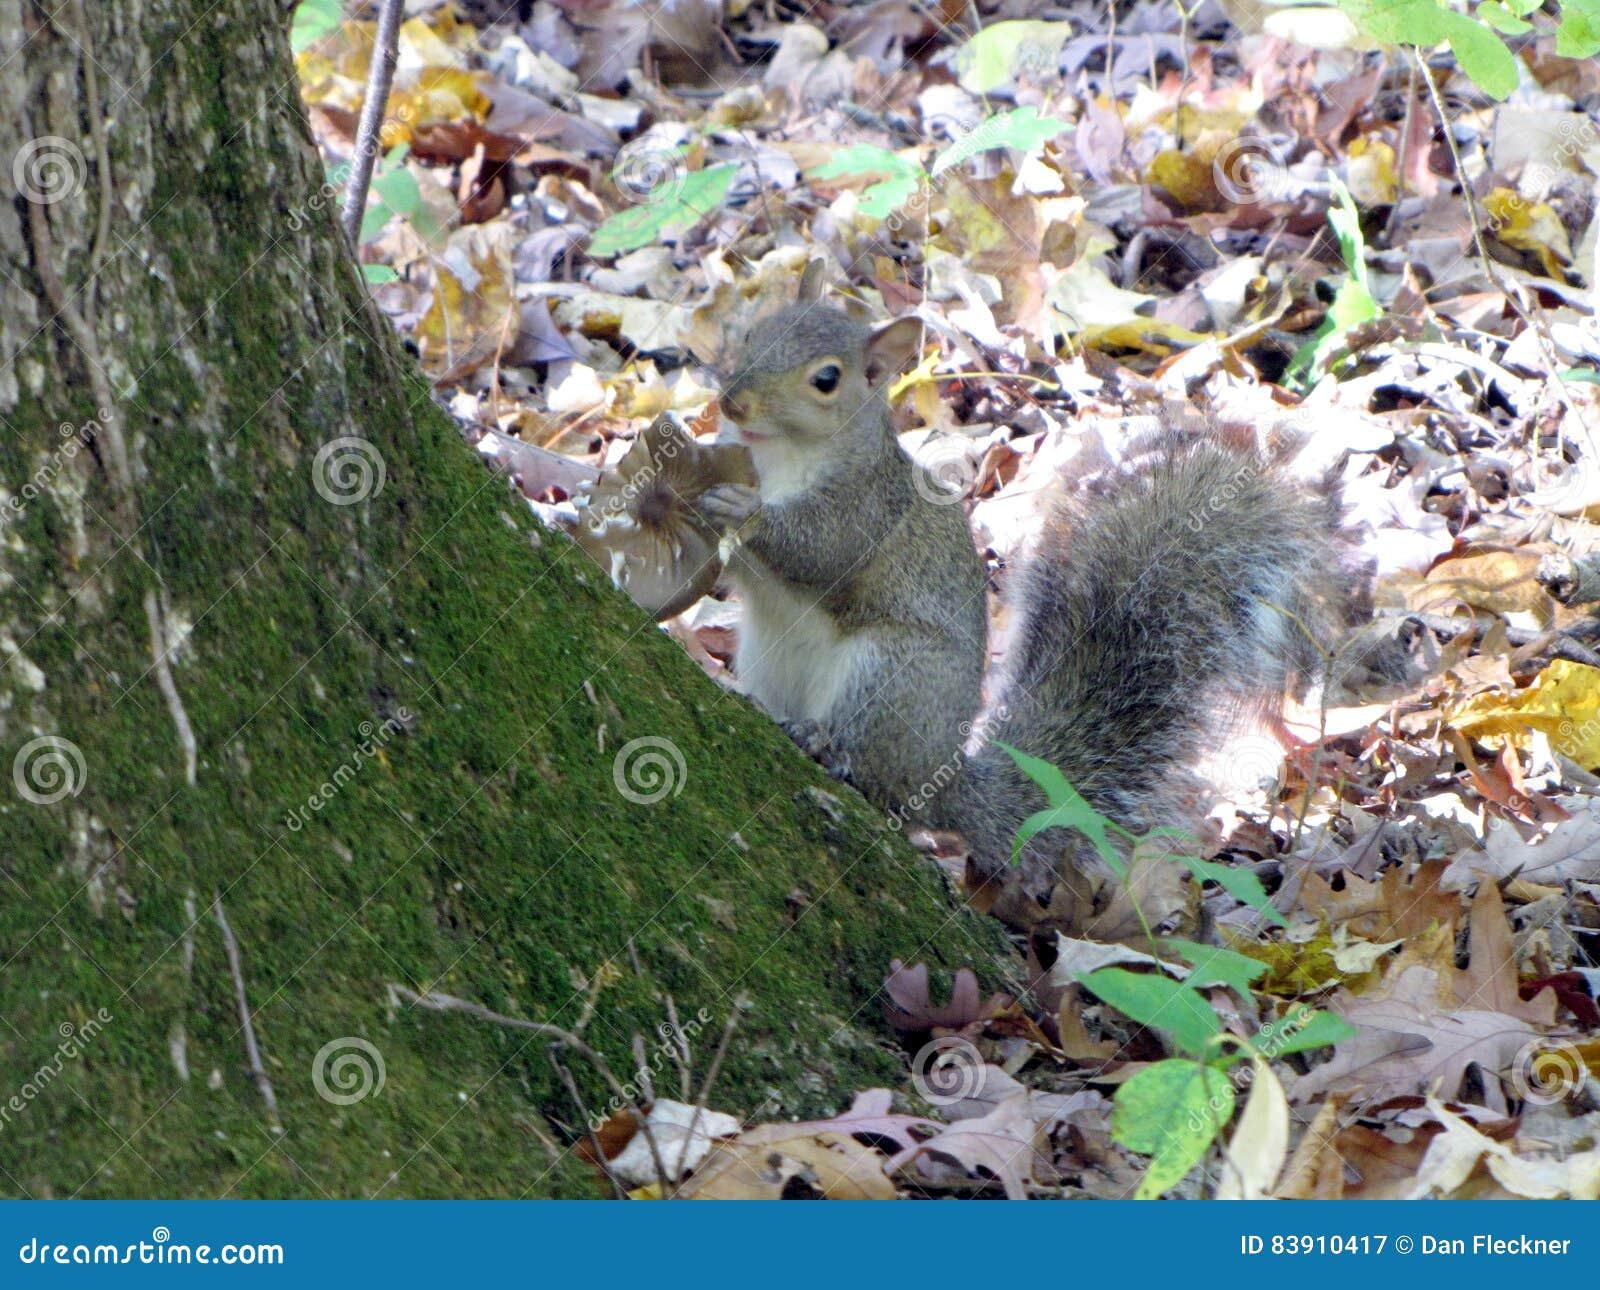 Grey Squirrel eats a mushroom